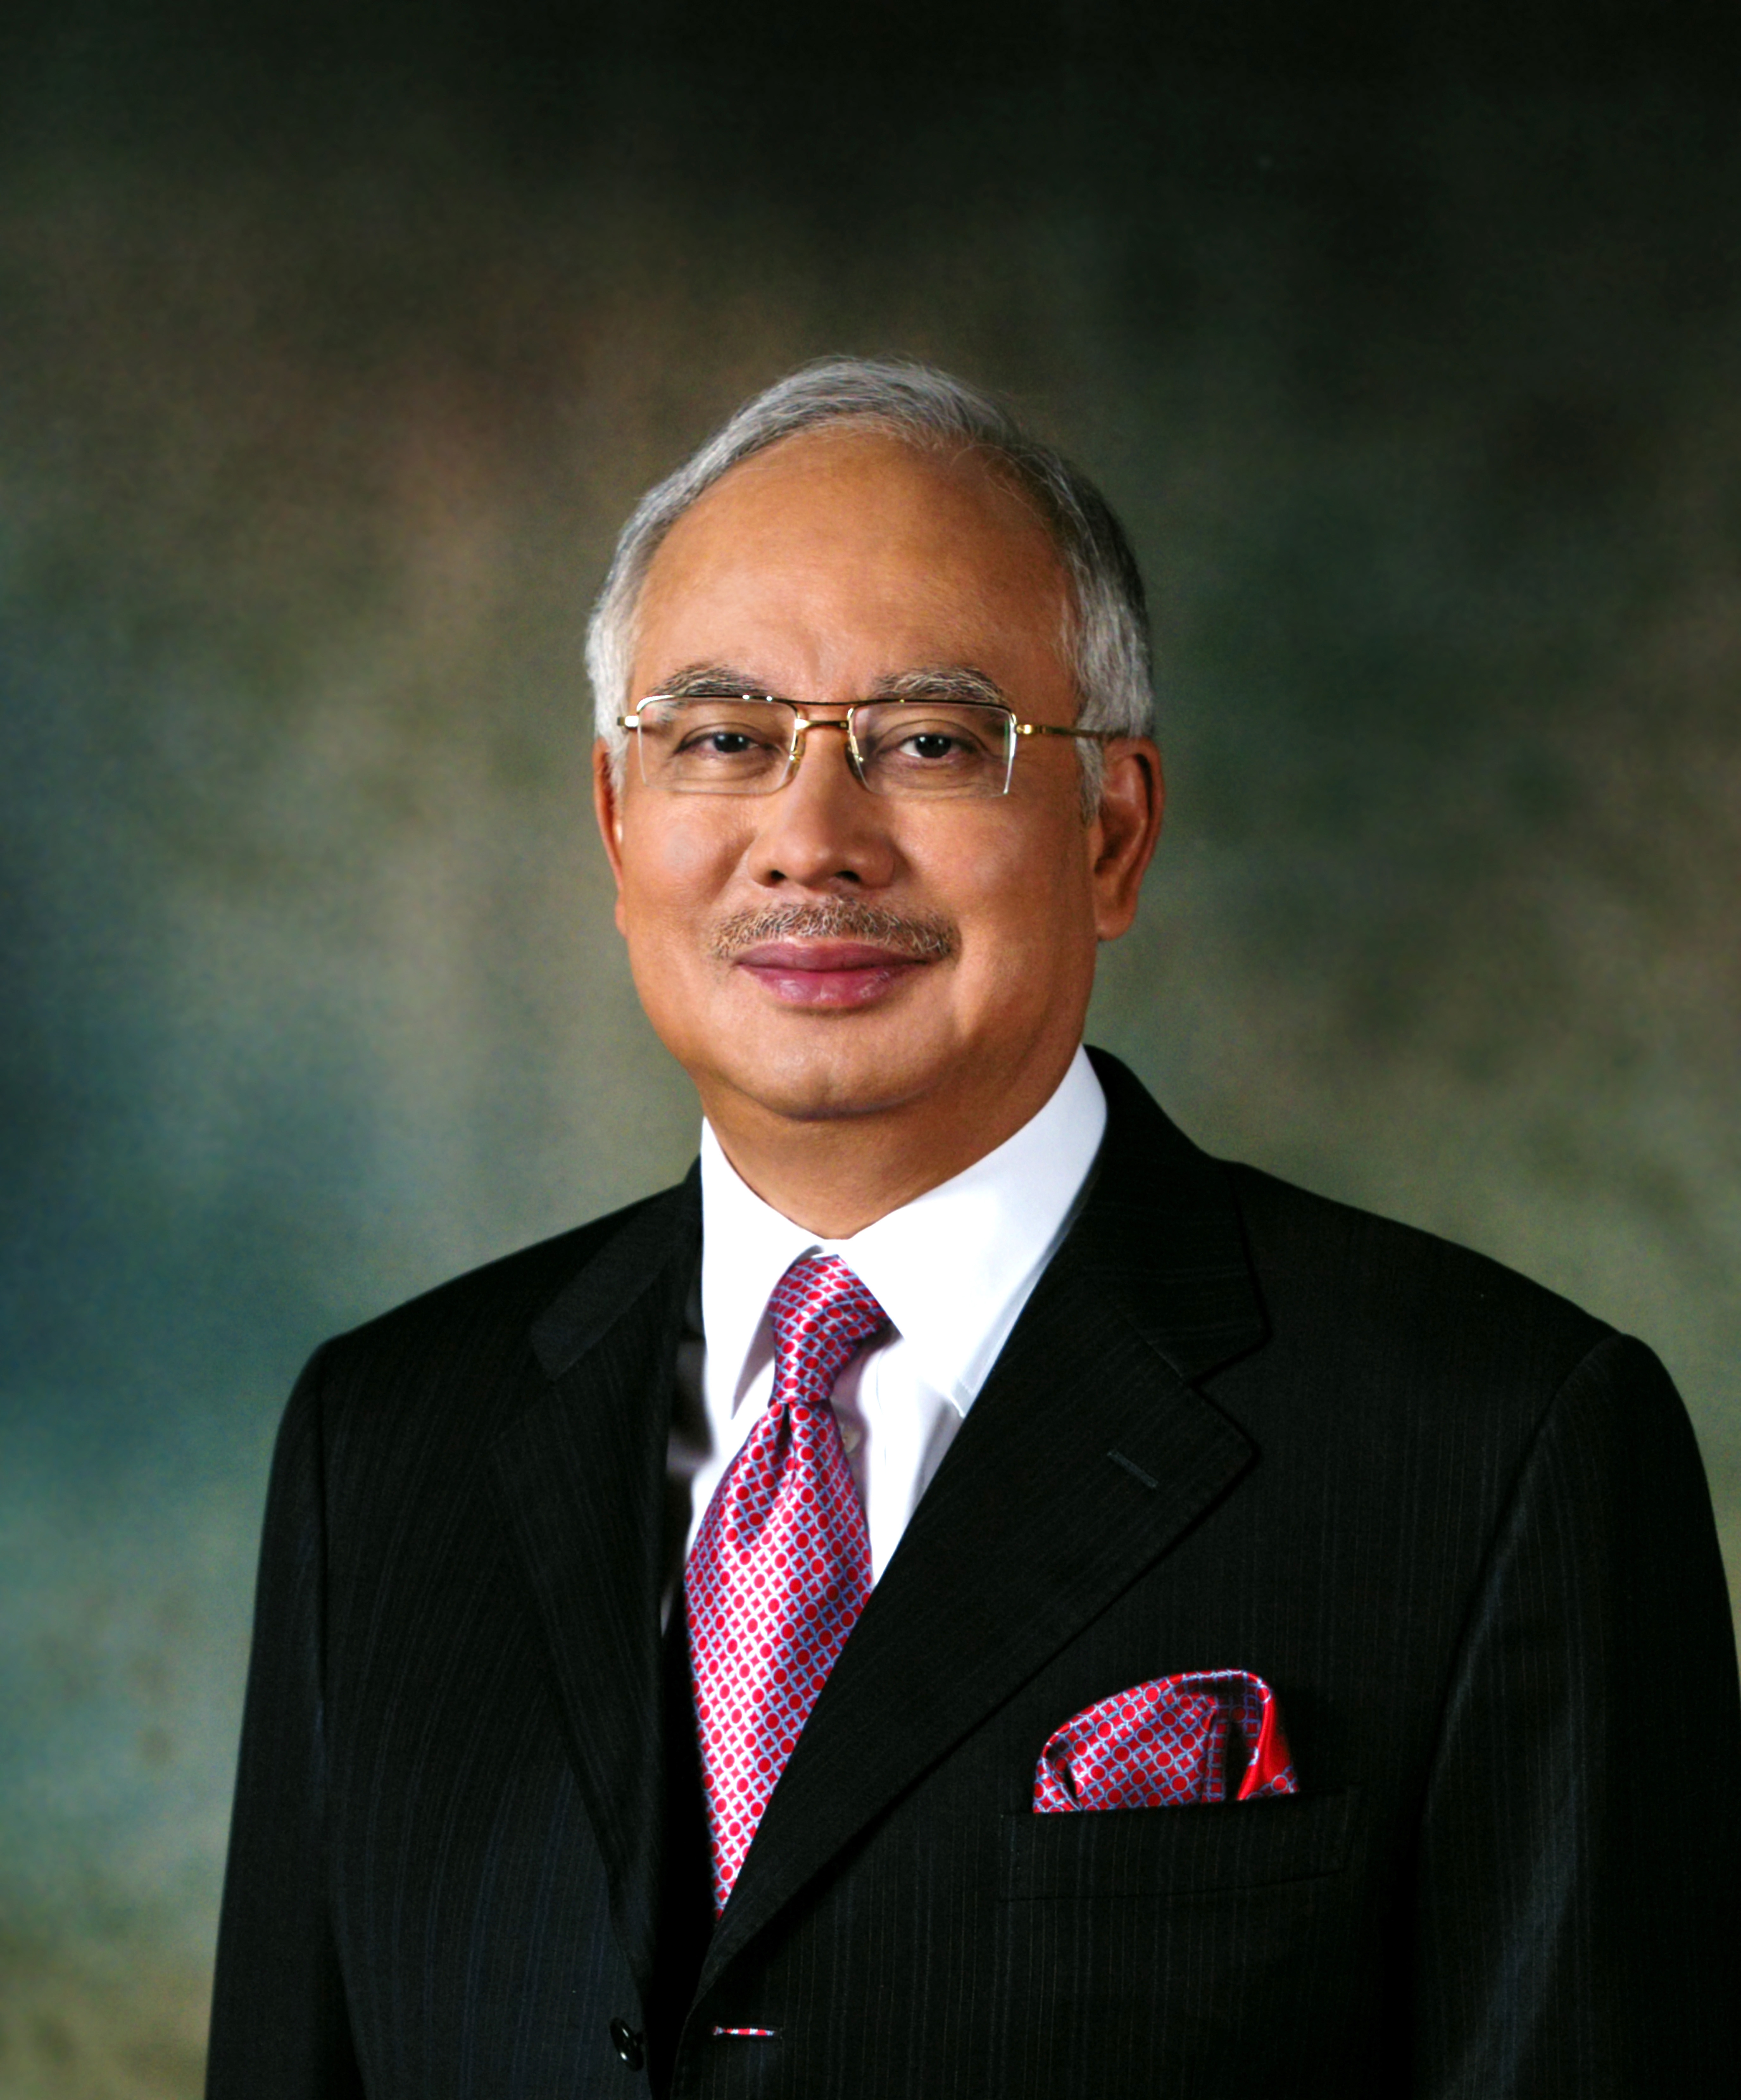 Najib Razak Wikipedia